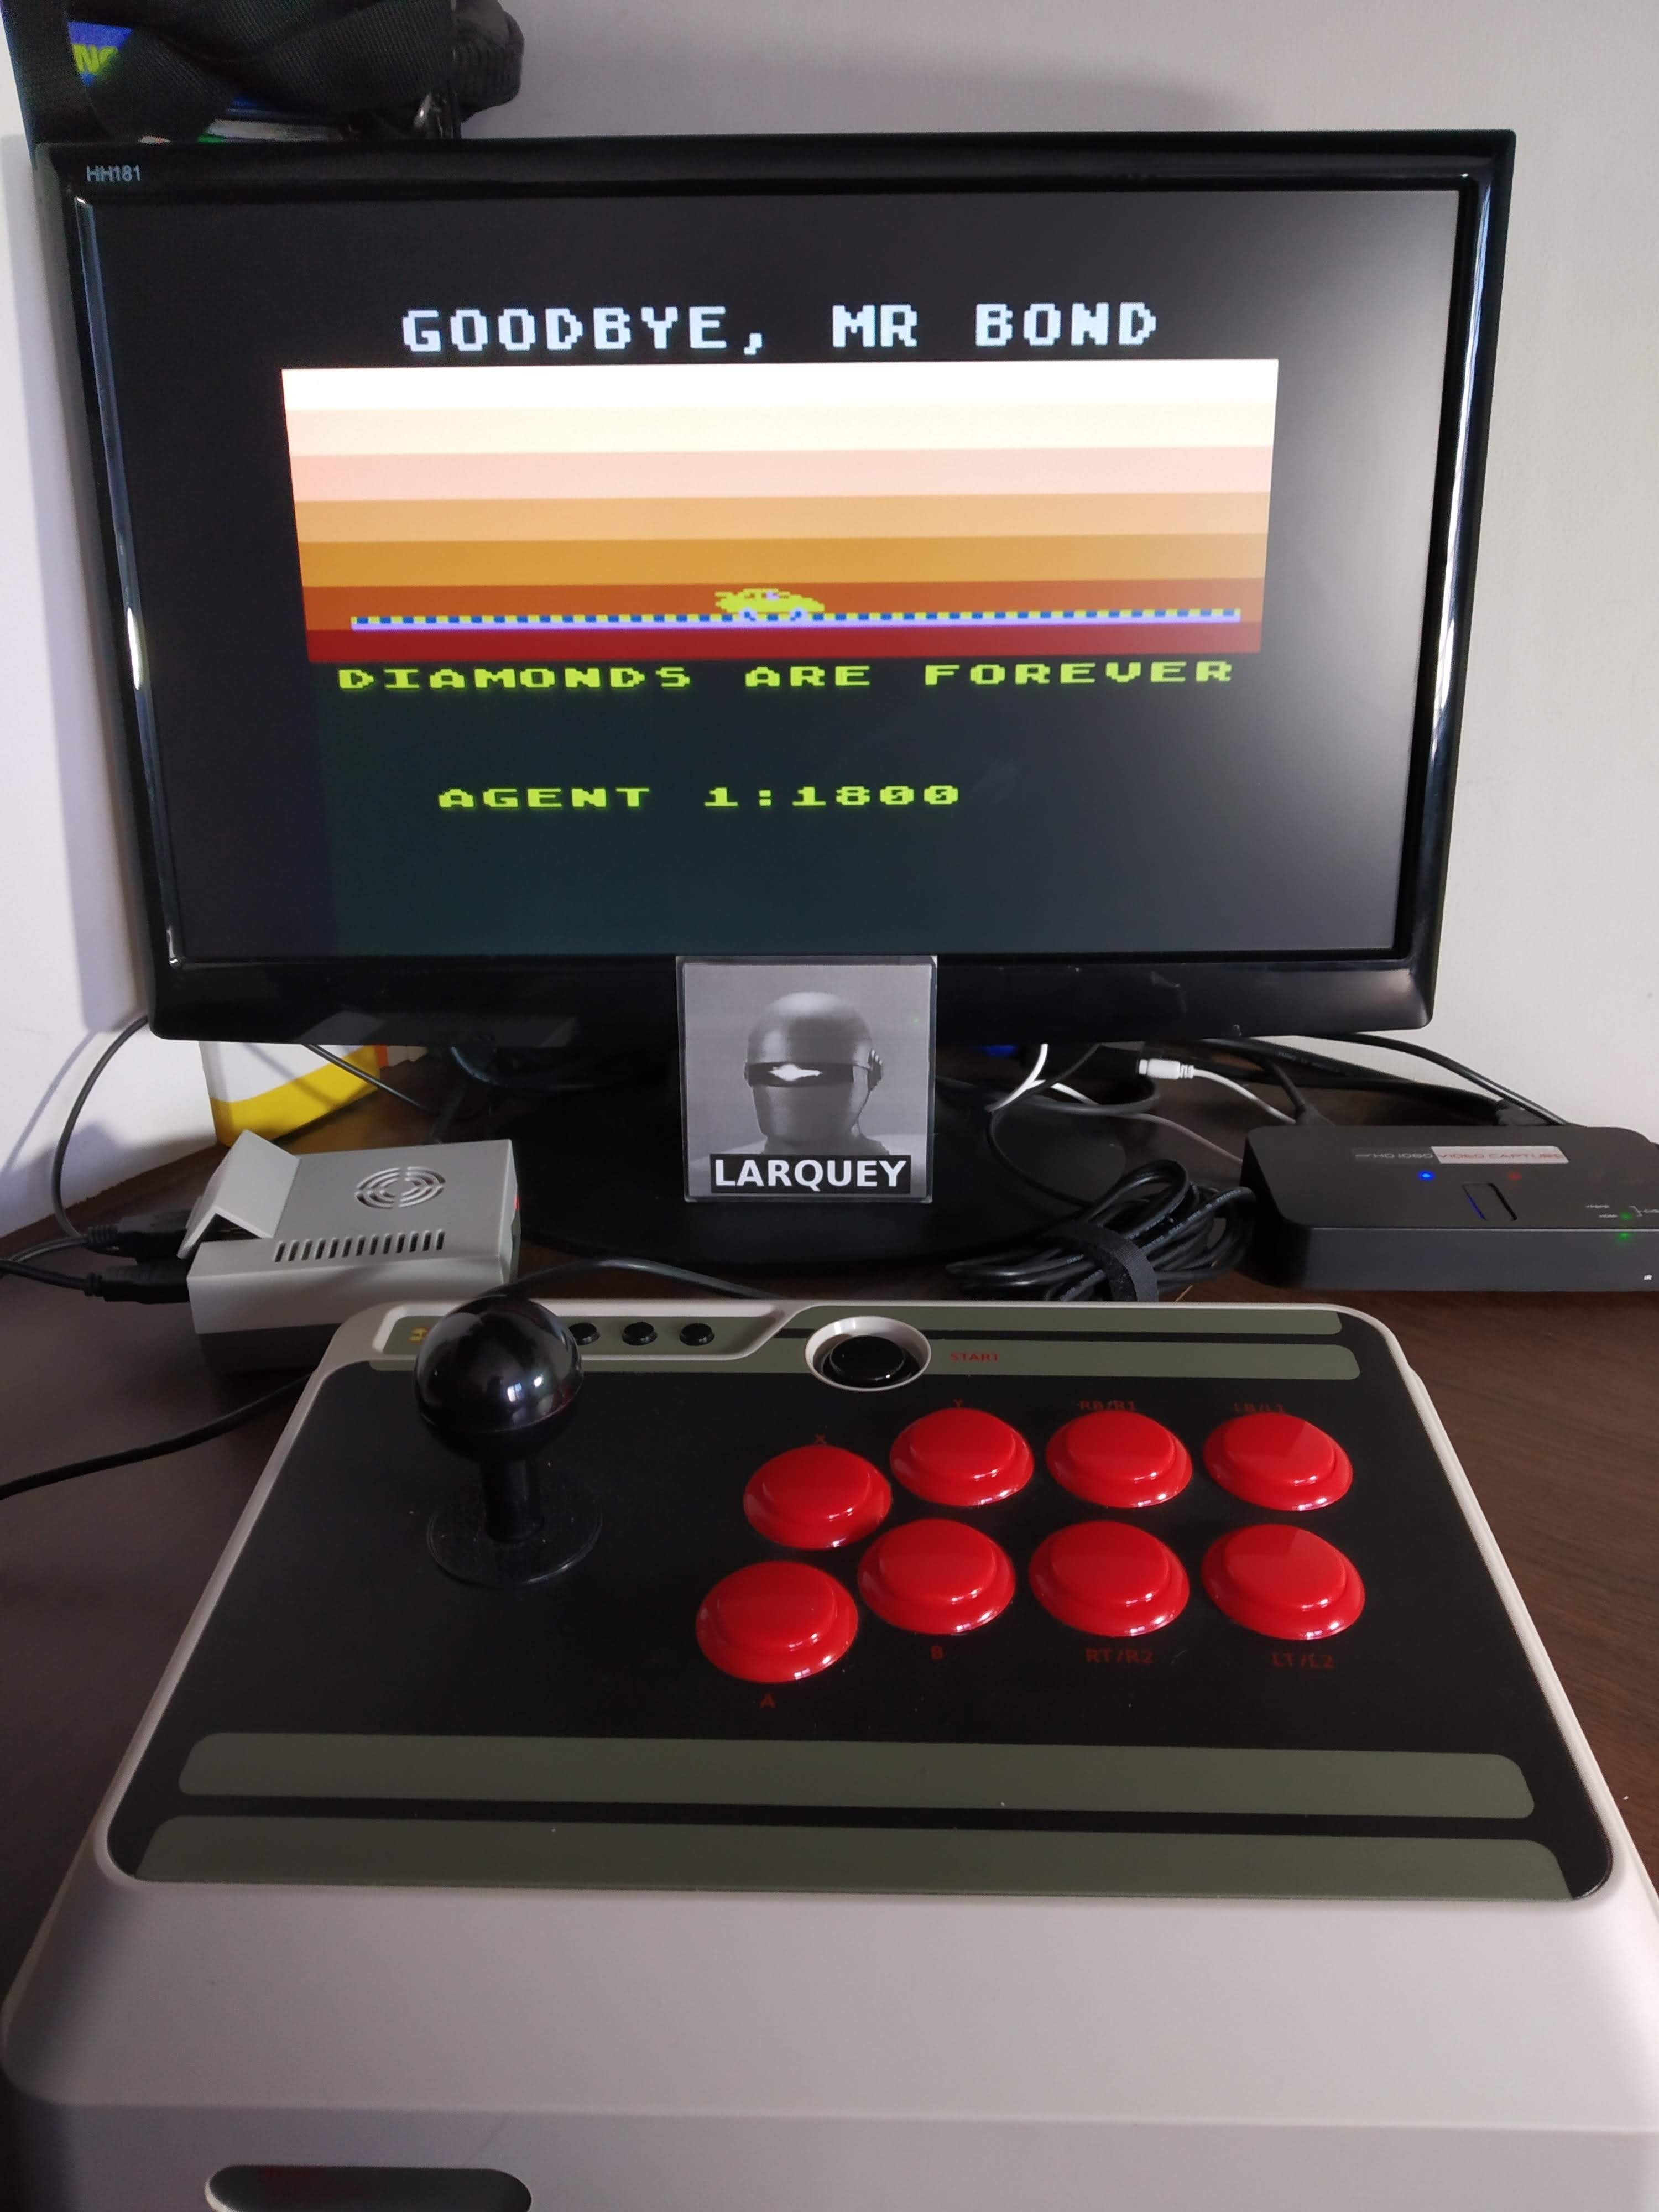 Larquey: James Bond 007 (Atari 5200 Emulated) 1,800 points on 2019-11-11 13:50:45